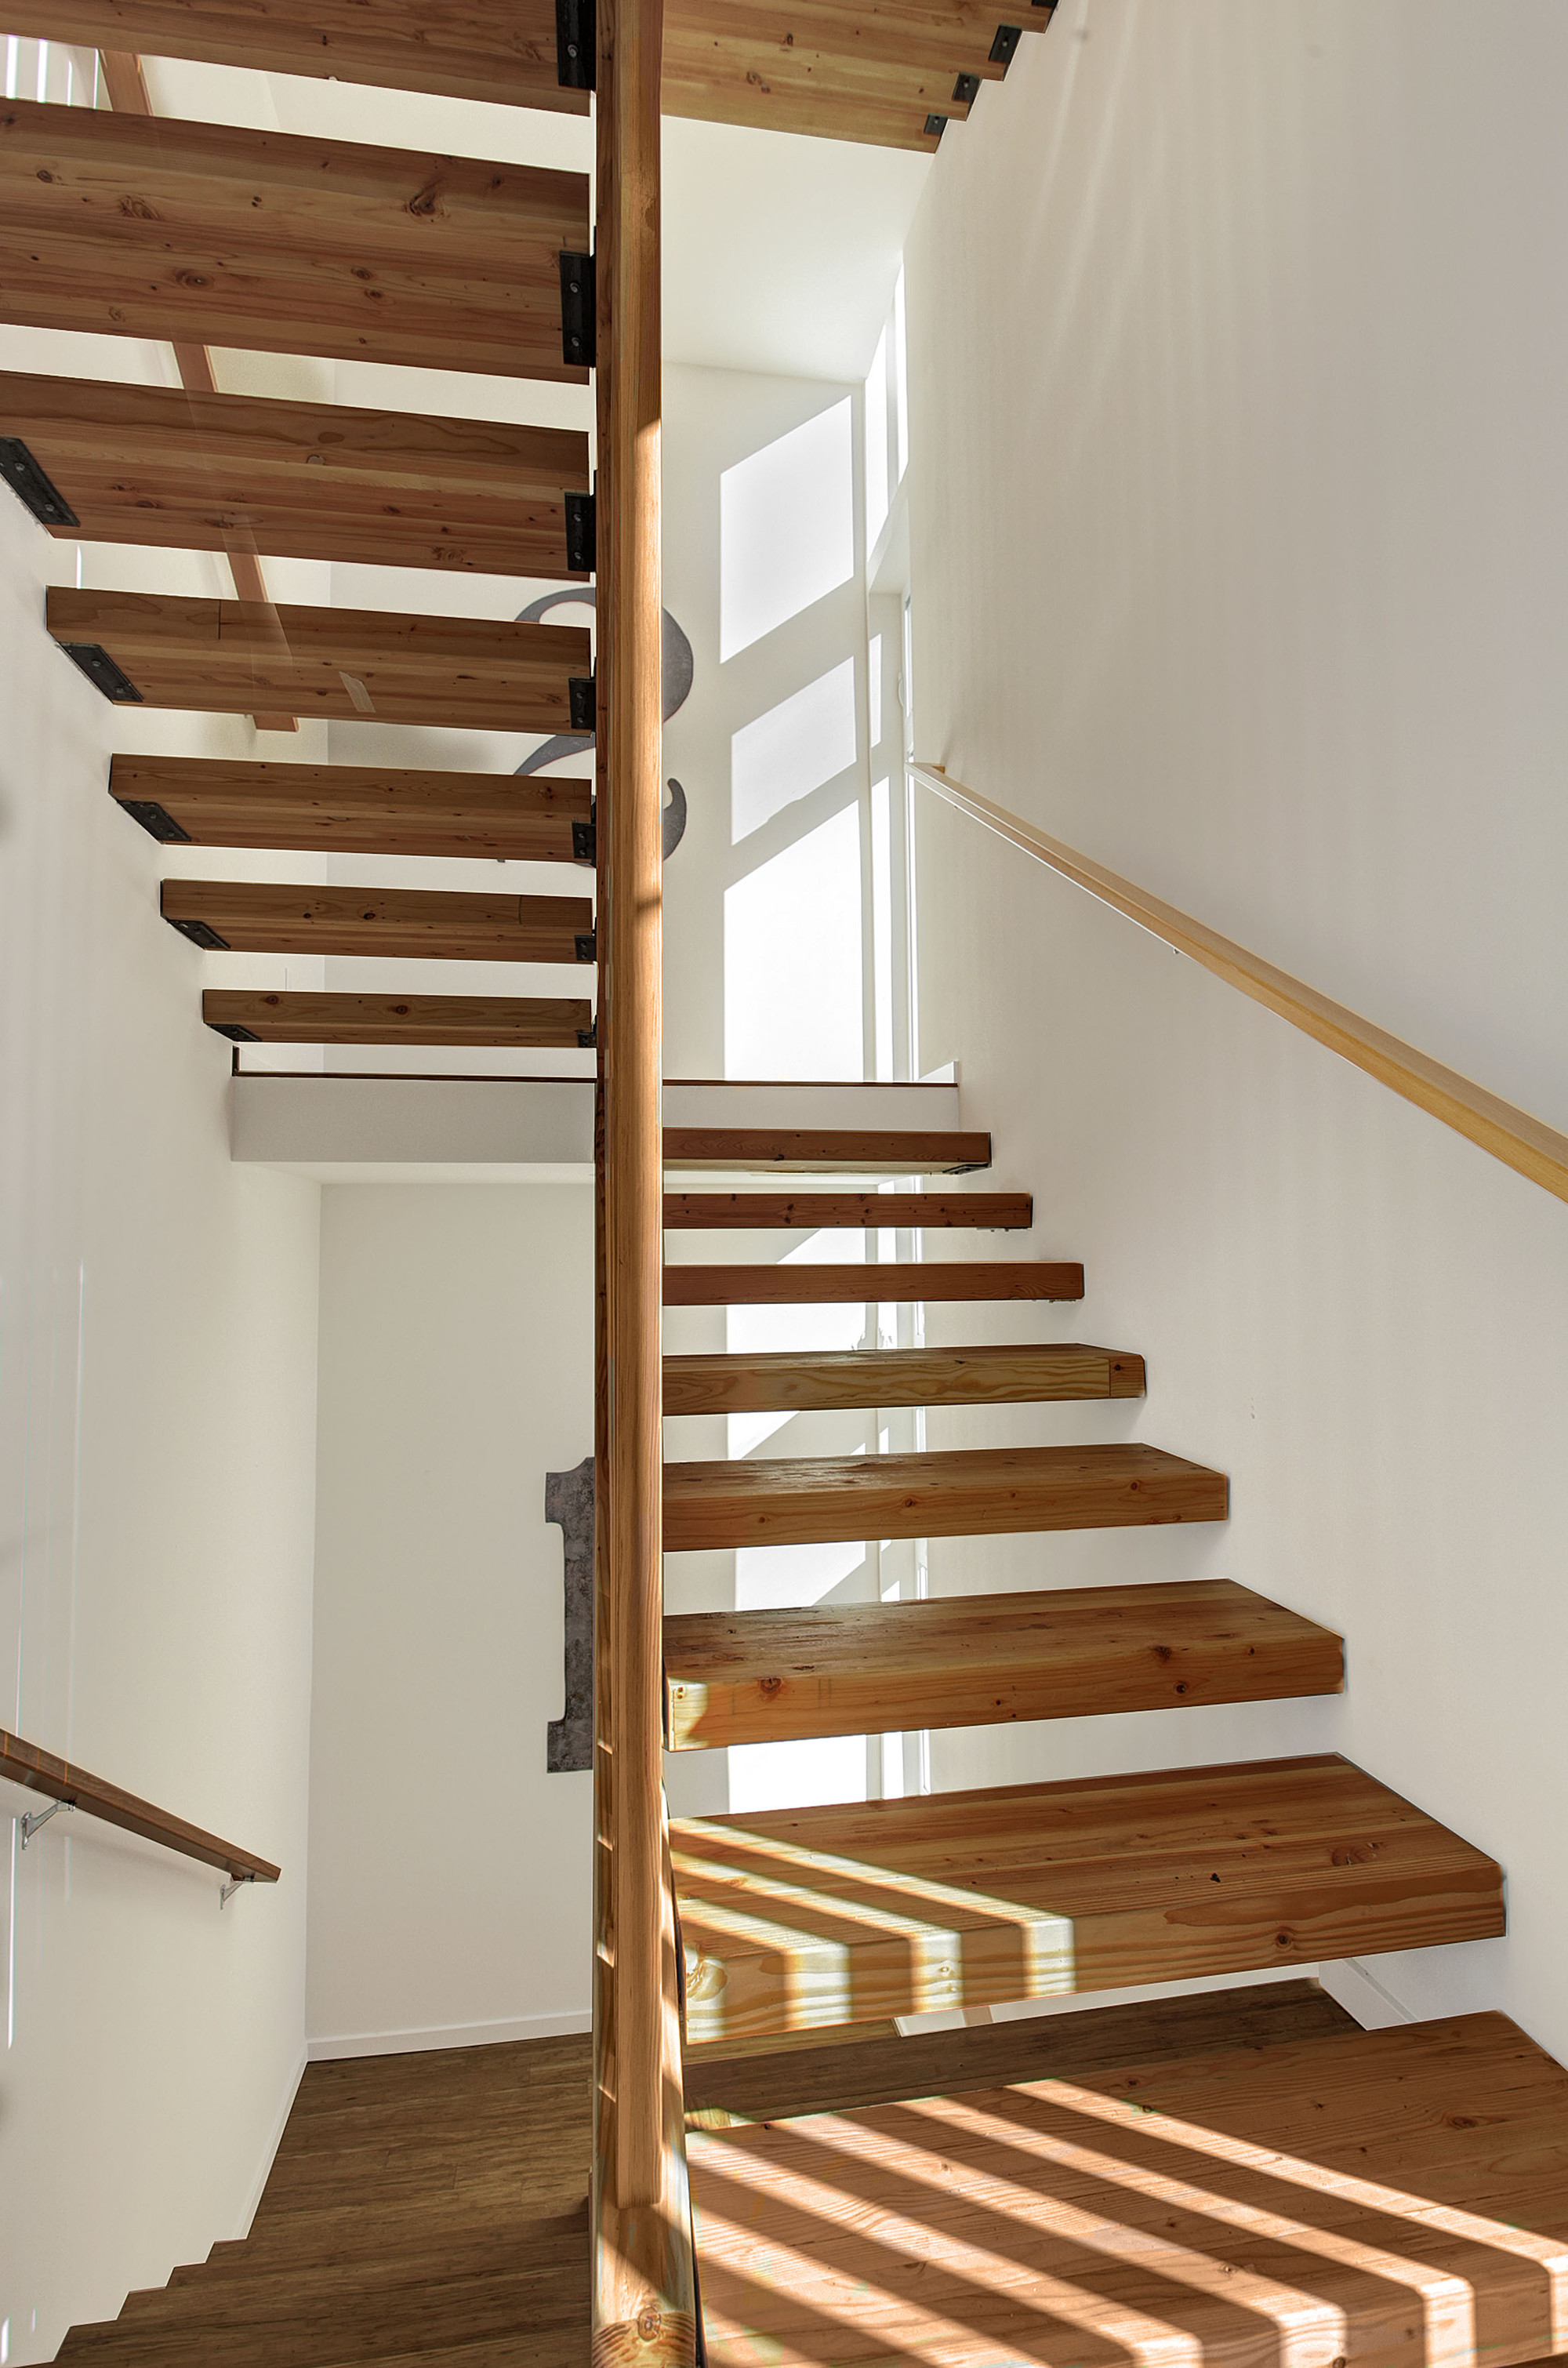 Modele Escalier Beton. Trendy Renovation Escalier Beton La R ...